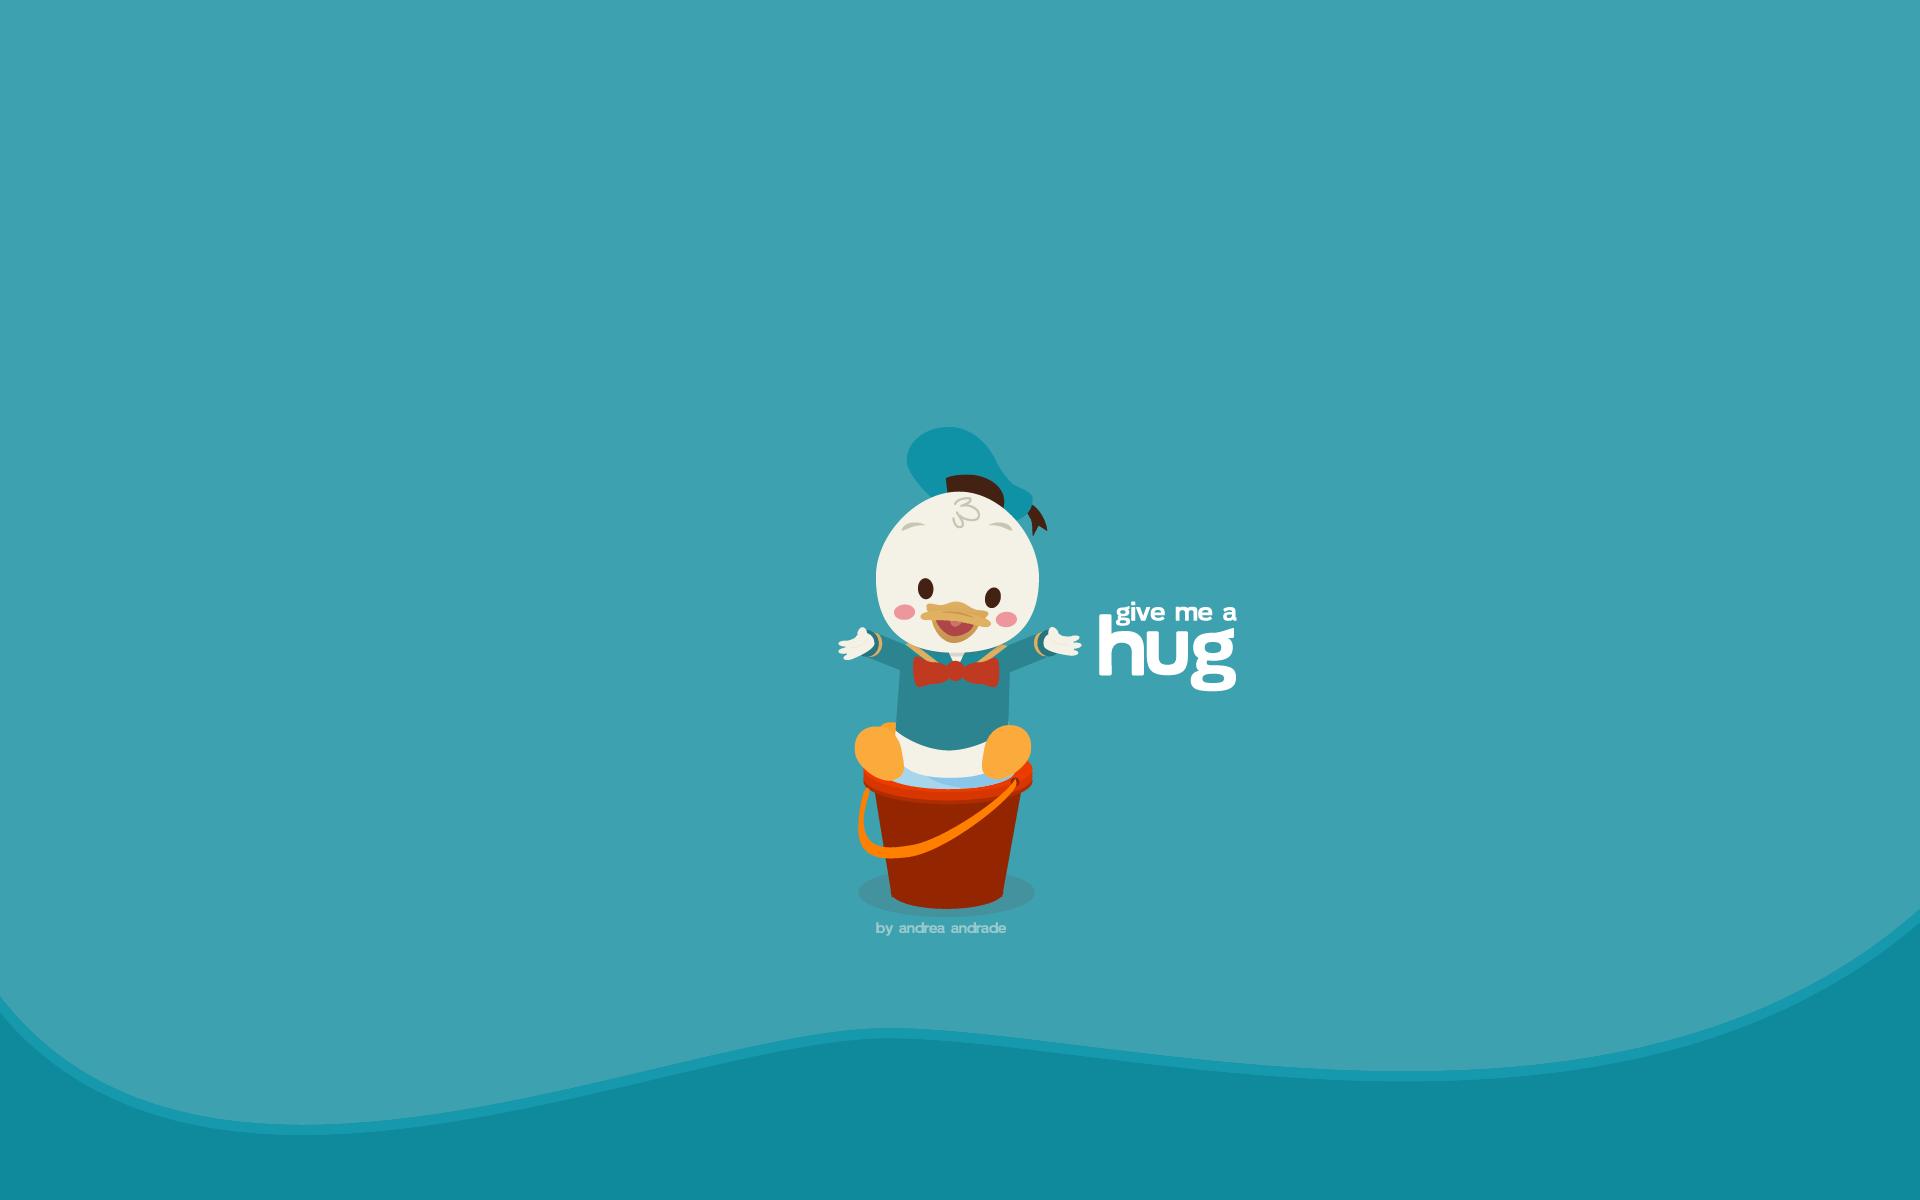 Cute Baby Wallpapers For Whatsapp Donald Duck Wallpapers For Desktop Pixelstalk Net